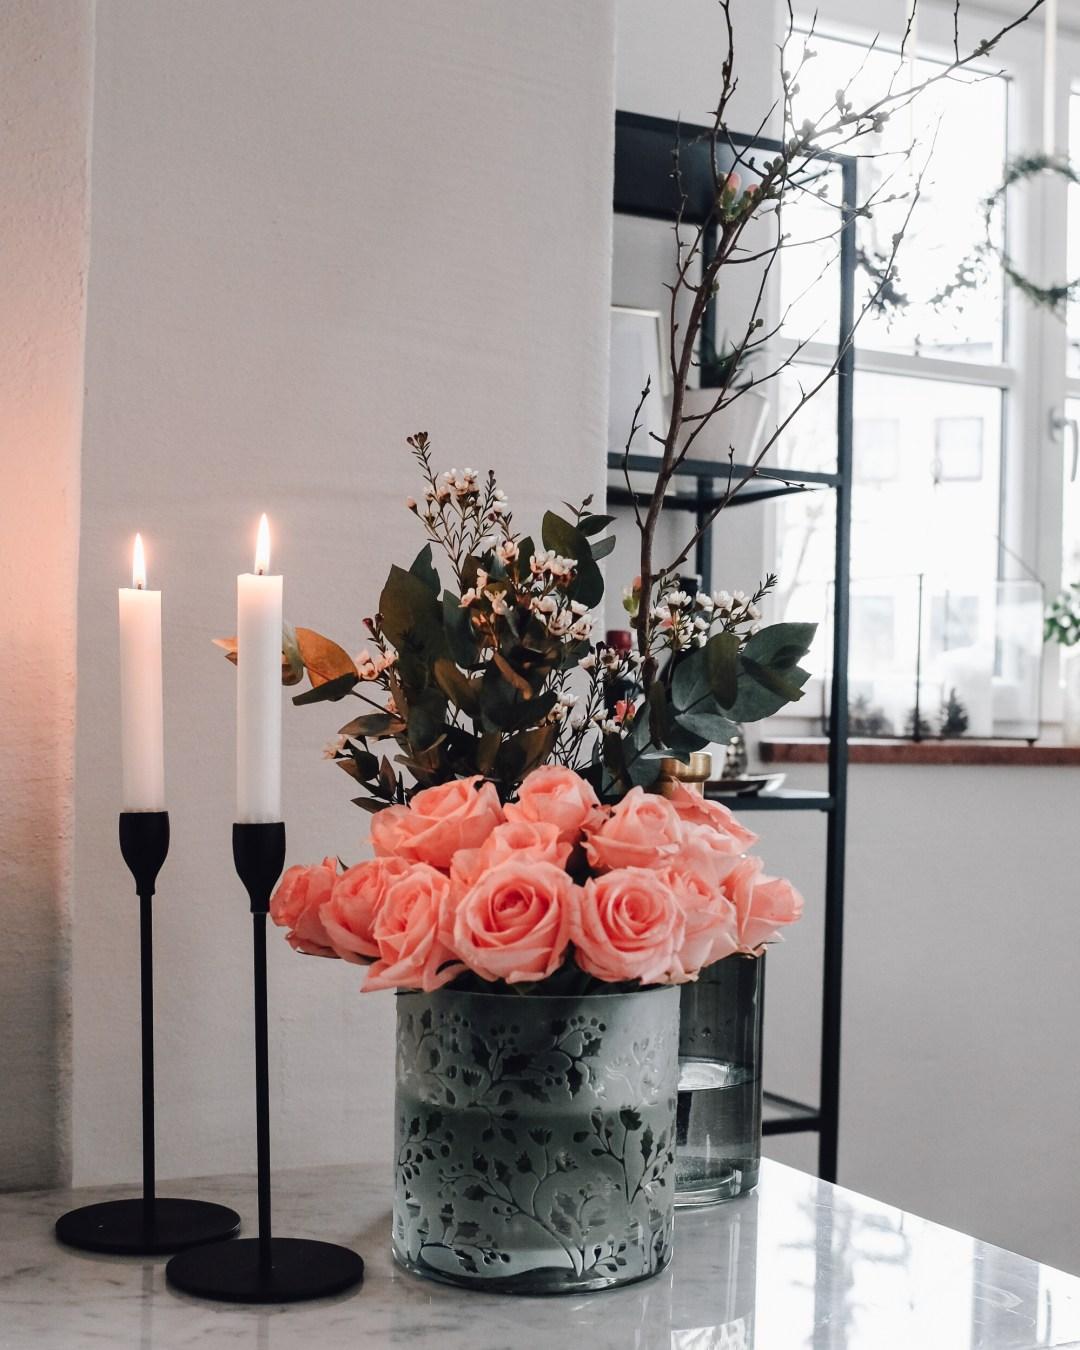 inastil, fashion, Wntermode, Leopoldskron, Salzburg, livingcoral, pantone, rosen, rosa, Pullover, Ü50Mode, ageless, ü50blogger,_-20